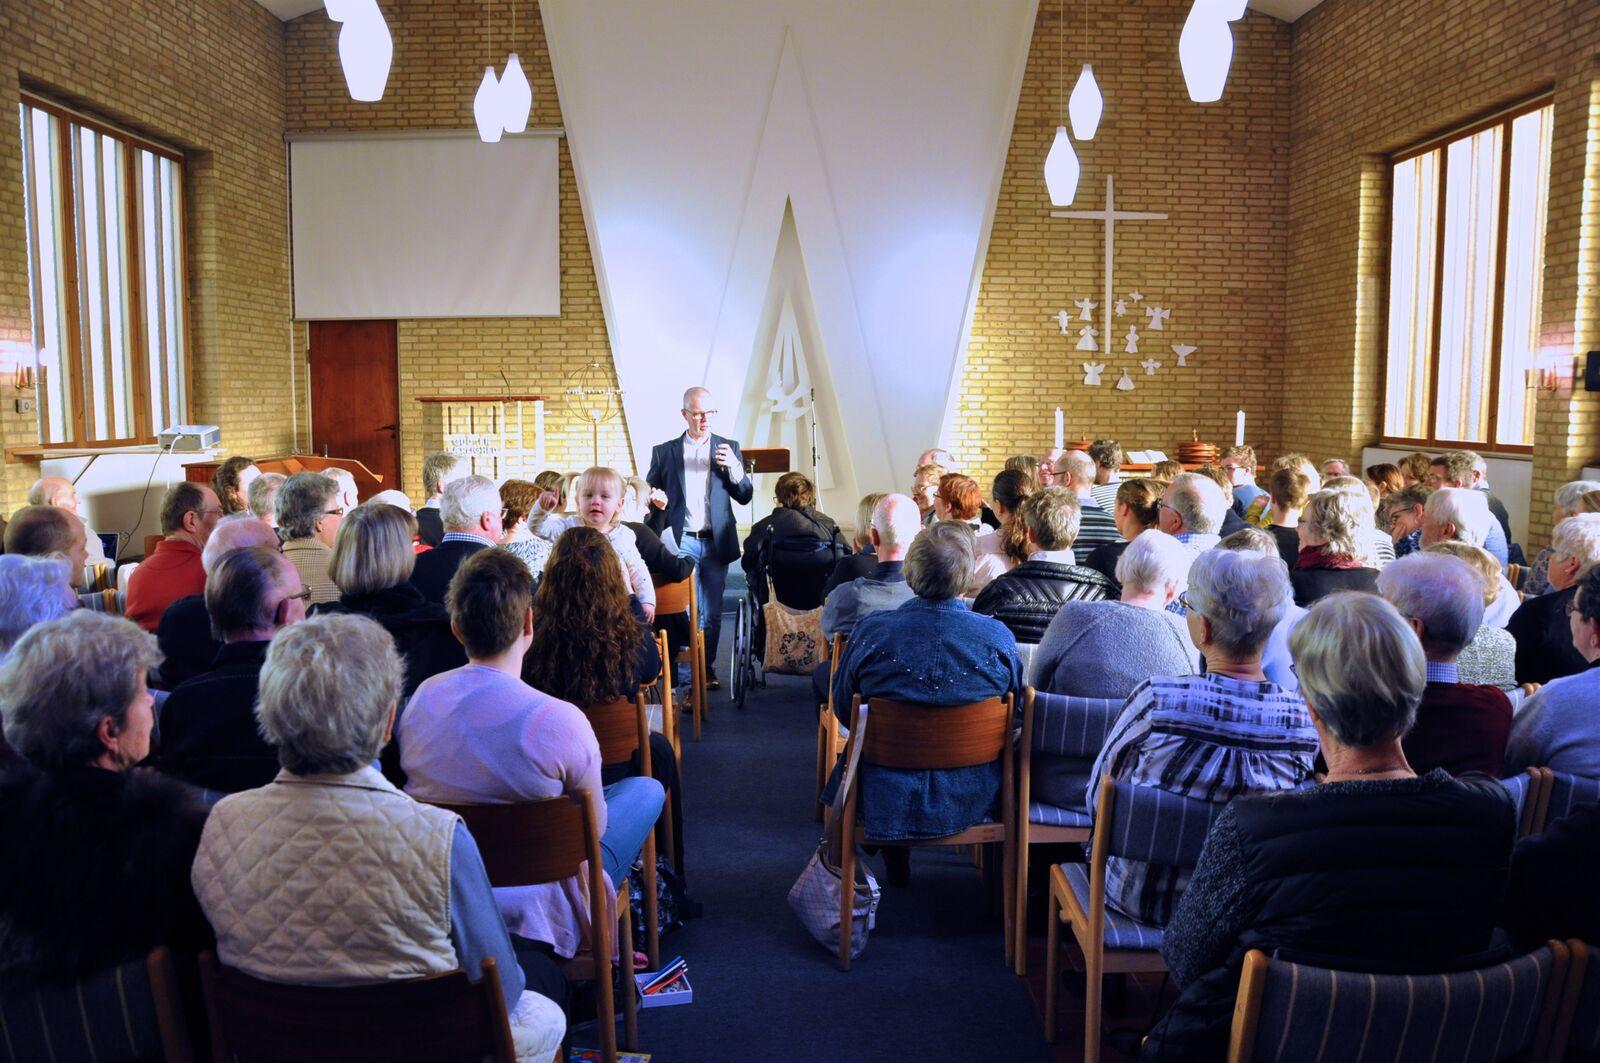 Den baptistiske gudstjeneste